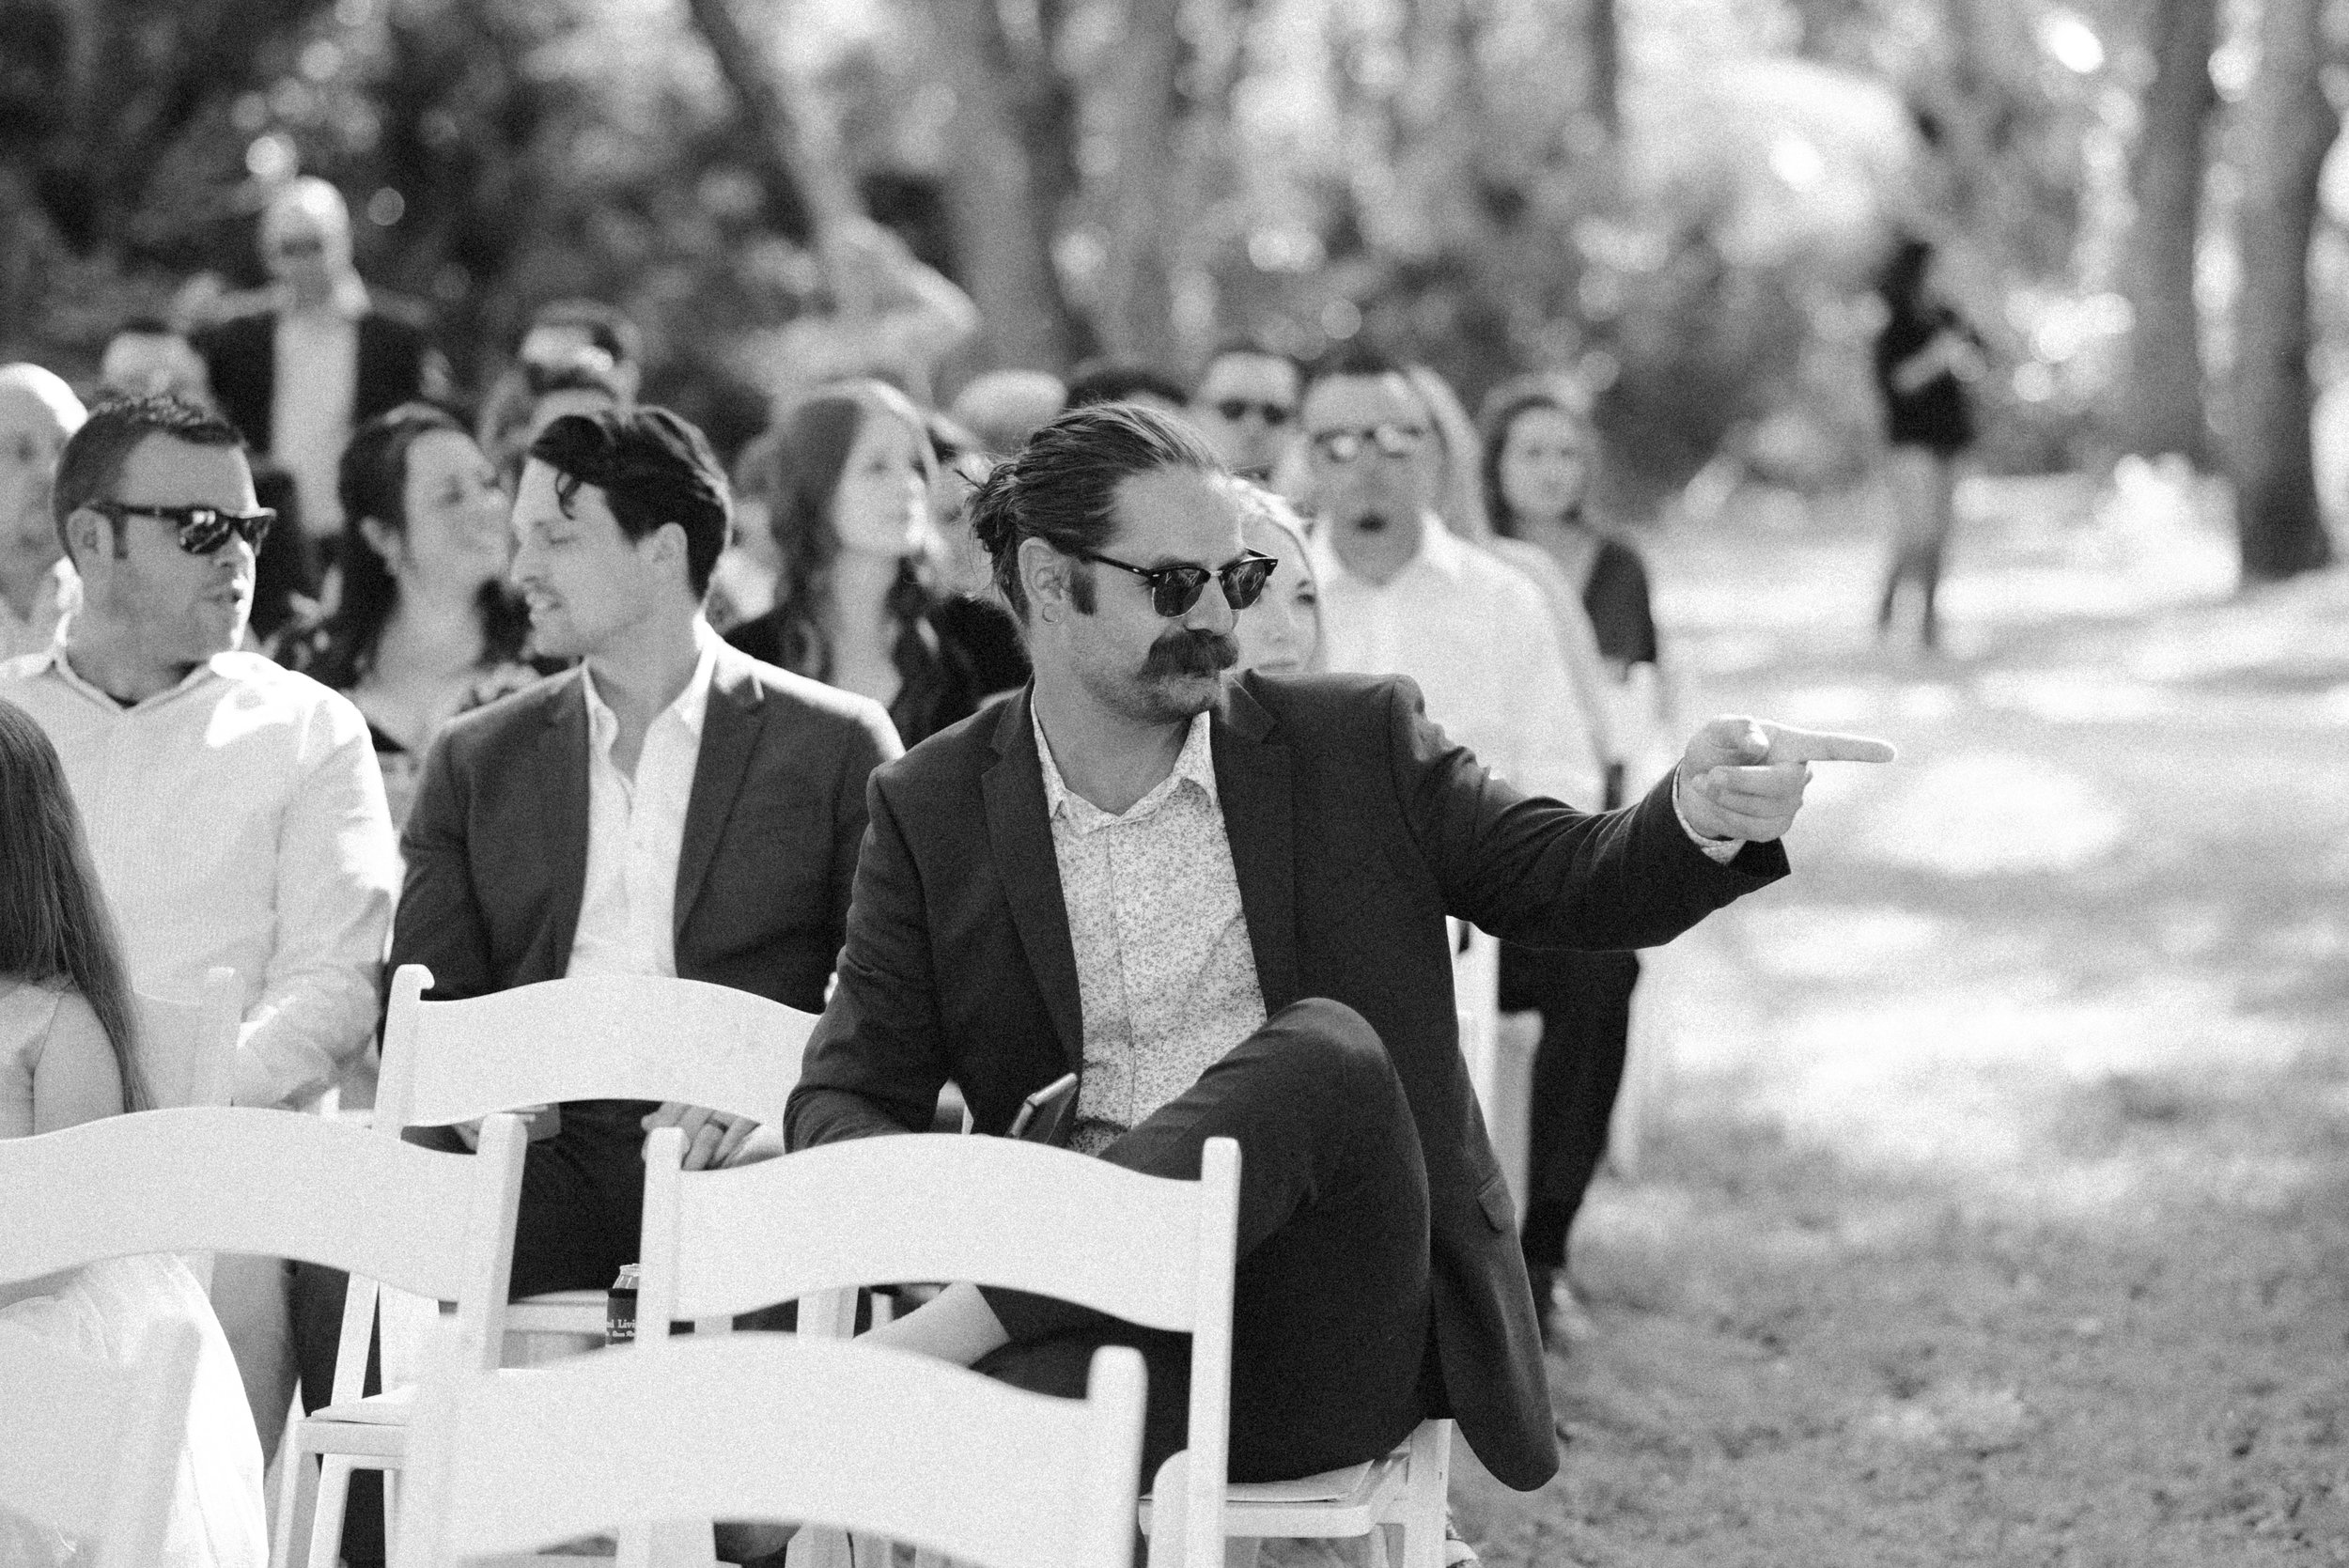 mclaughlin-wedding-403.jpg